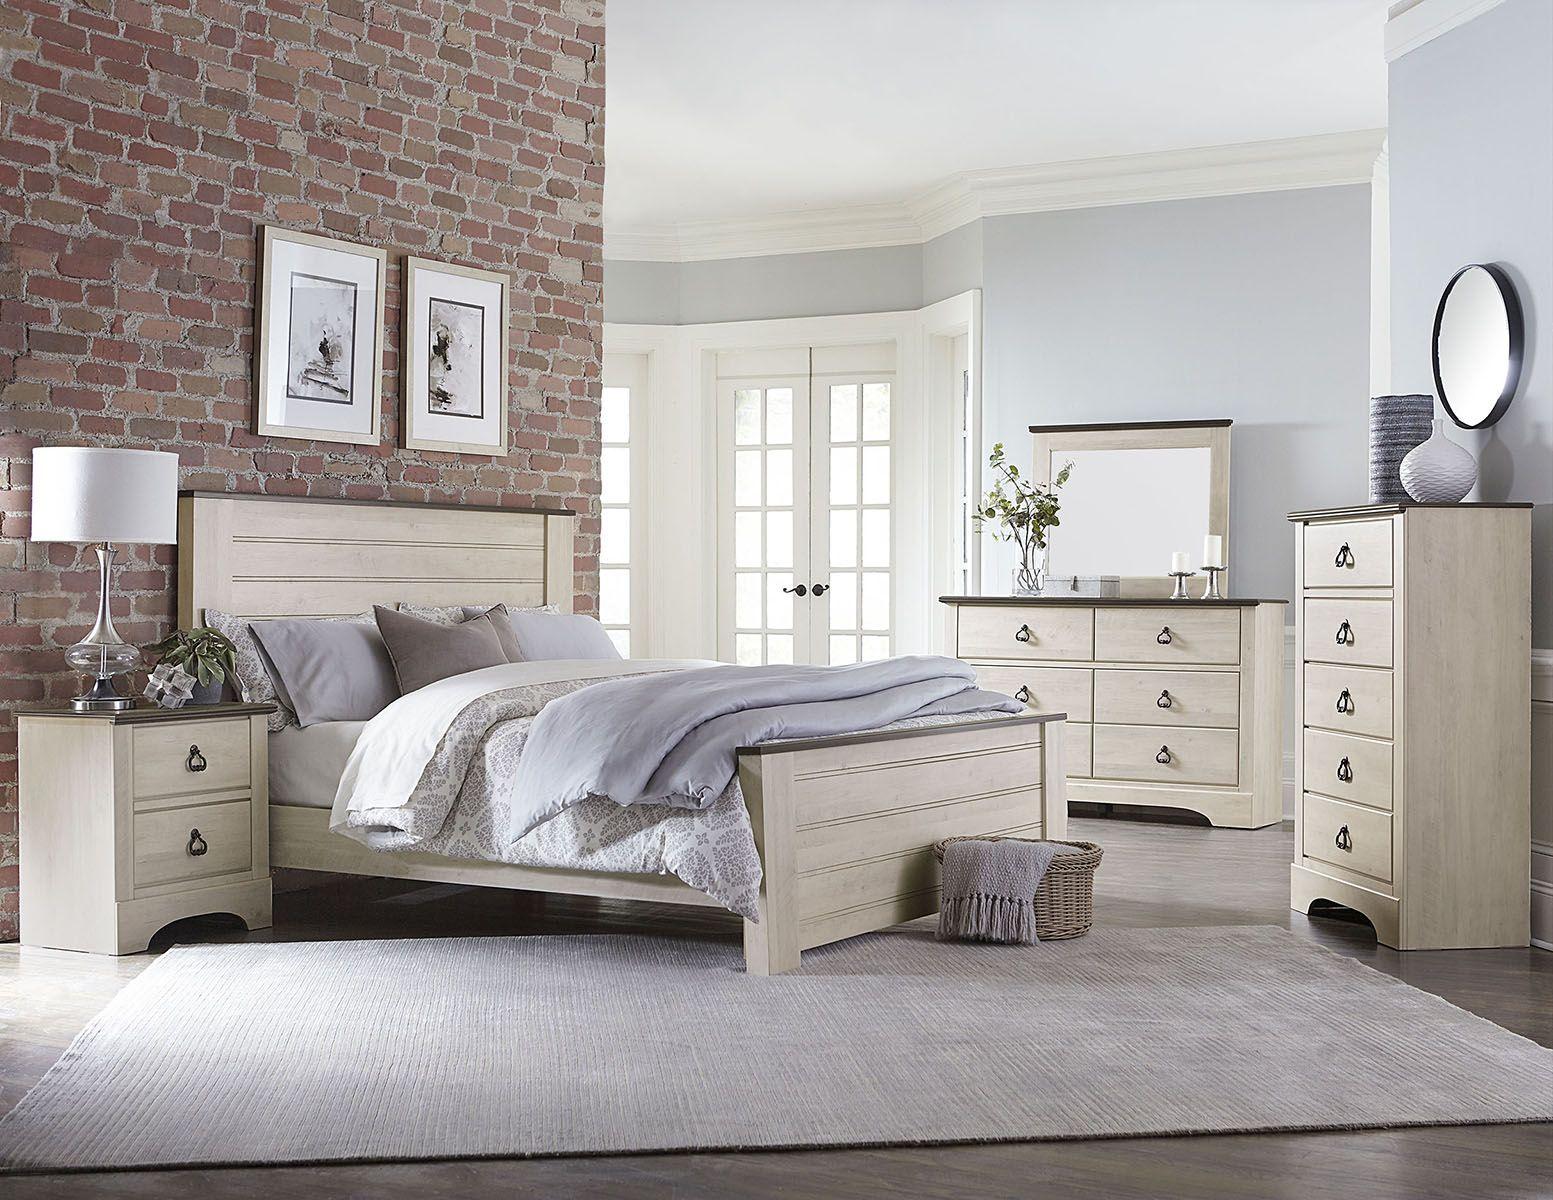 Standard Rivervale 4pc Distressed Poster Bedroom Set in